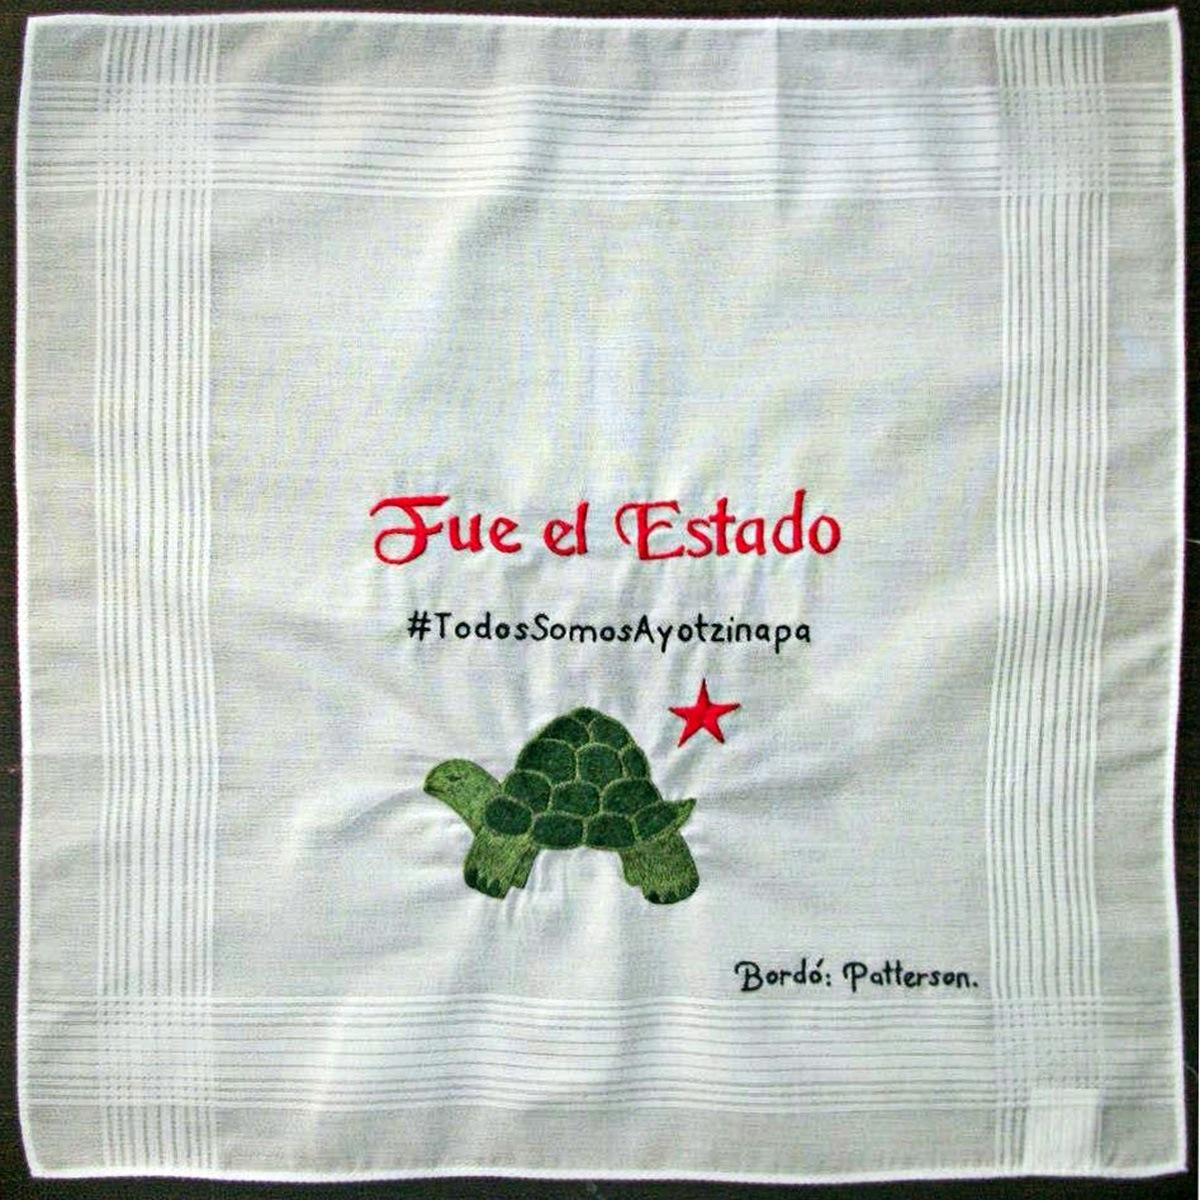 Tribute to the Disappeared_Patterson_Fue el Estado=